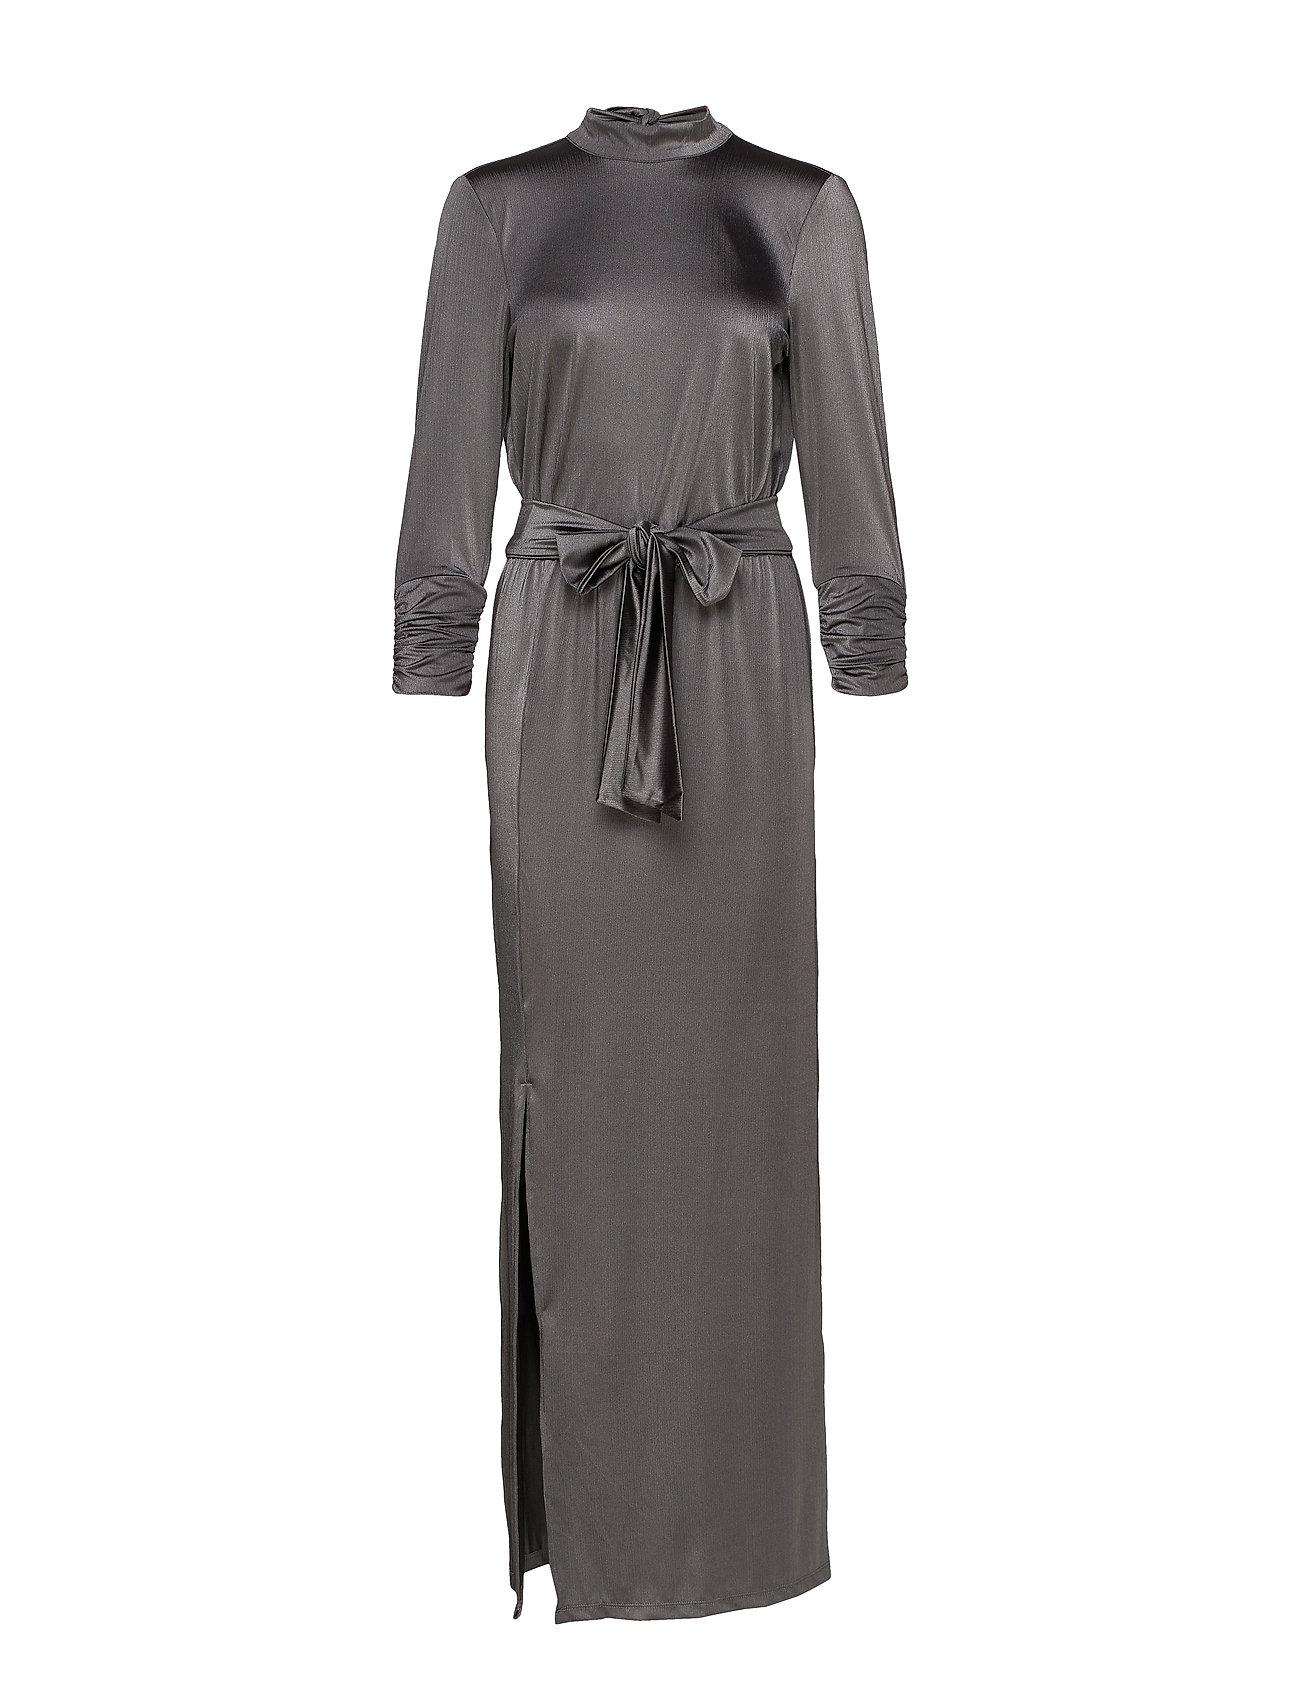 Gestuz RizaGZ dress YE19 - GRAY FLANNEL